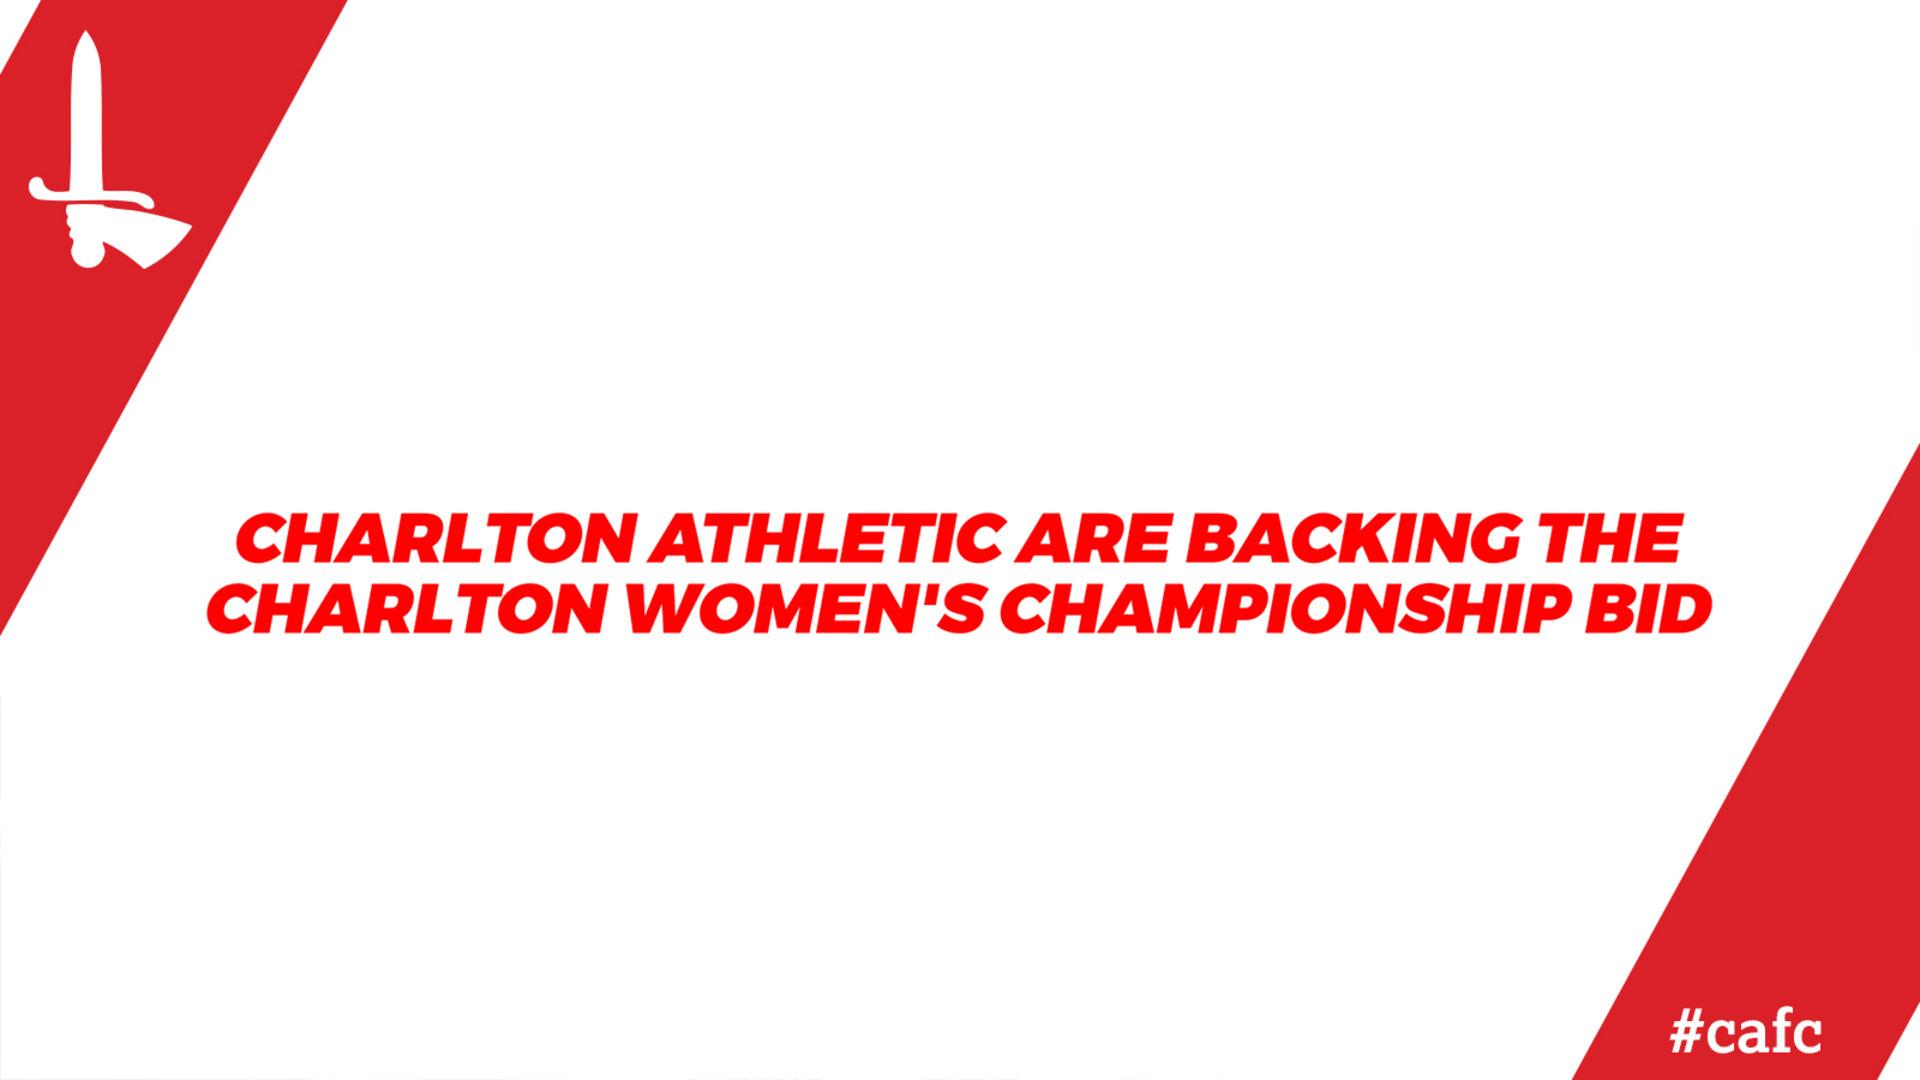 Charlton Women's Championship bid